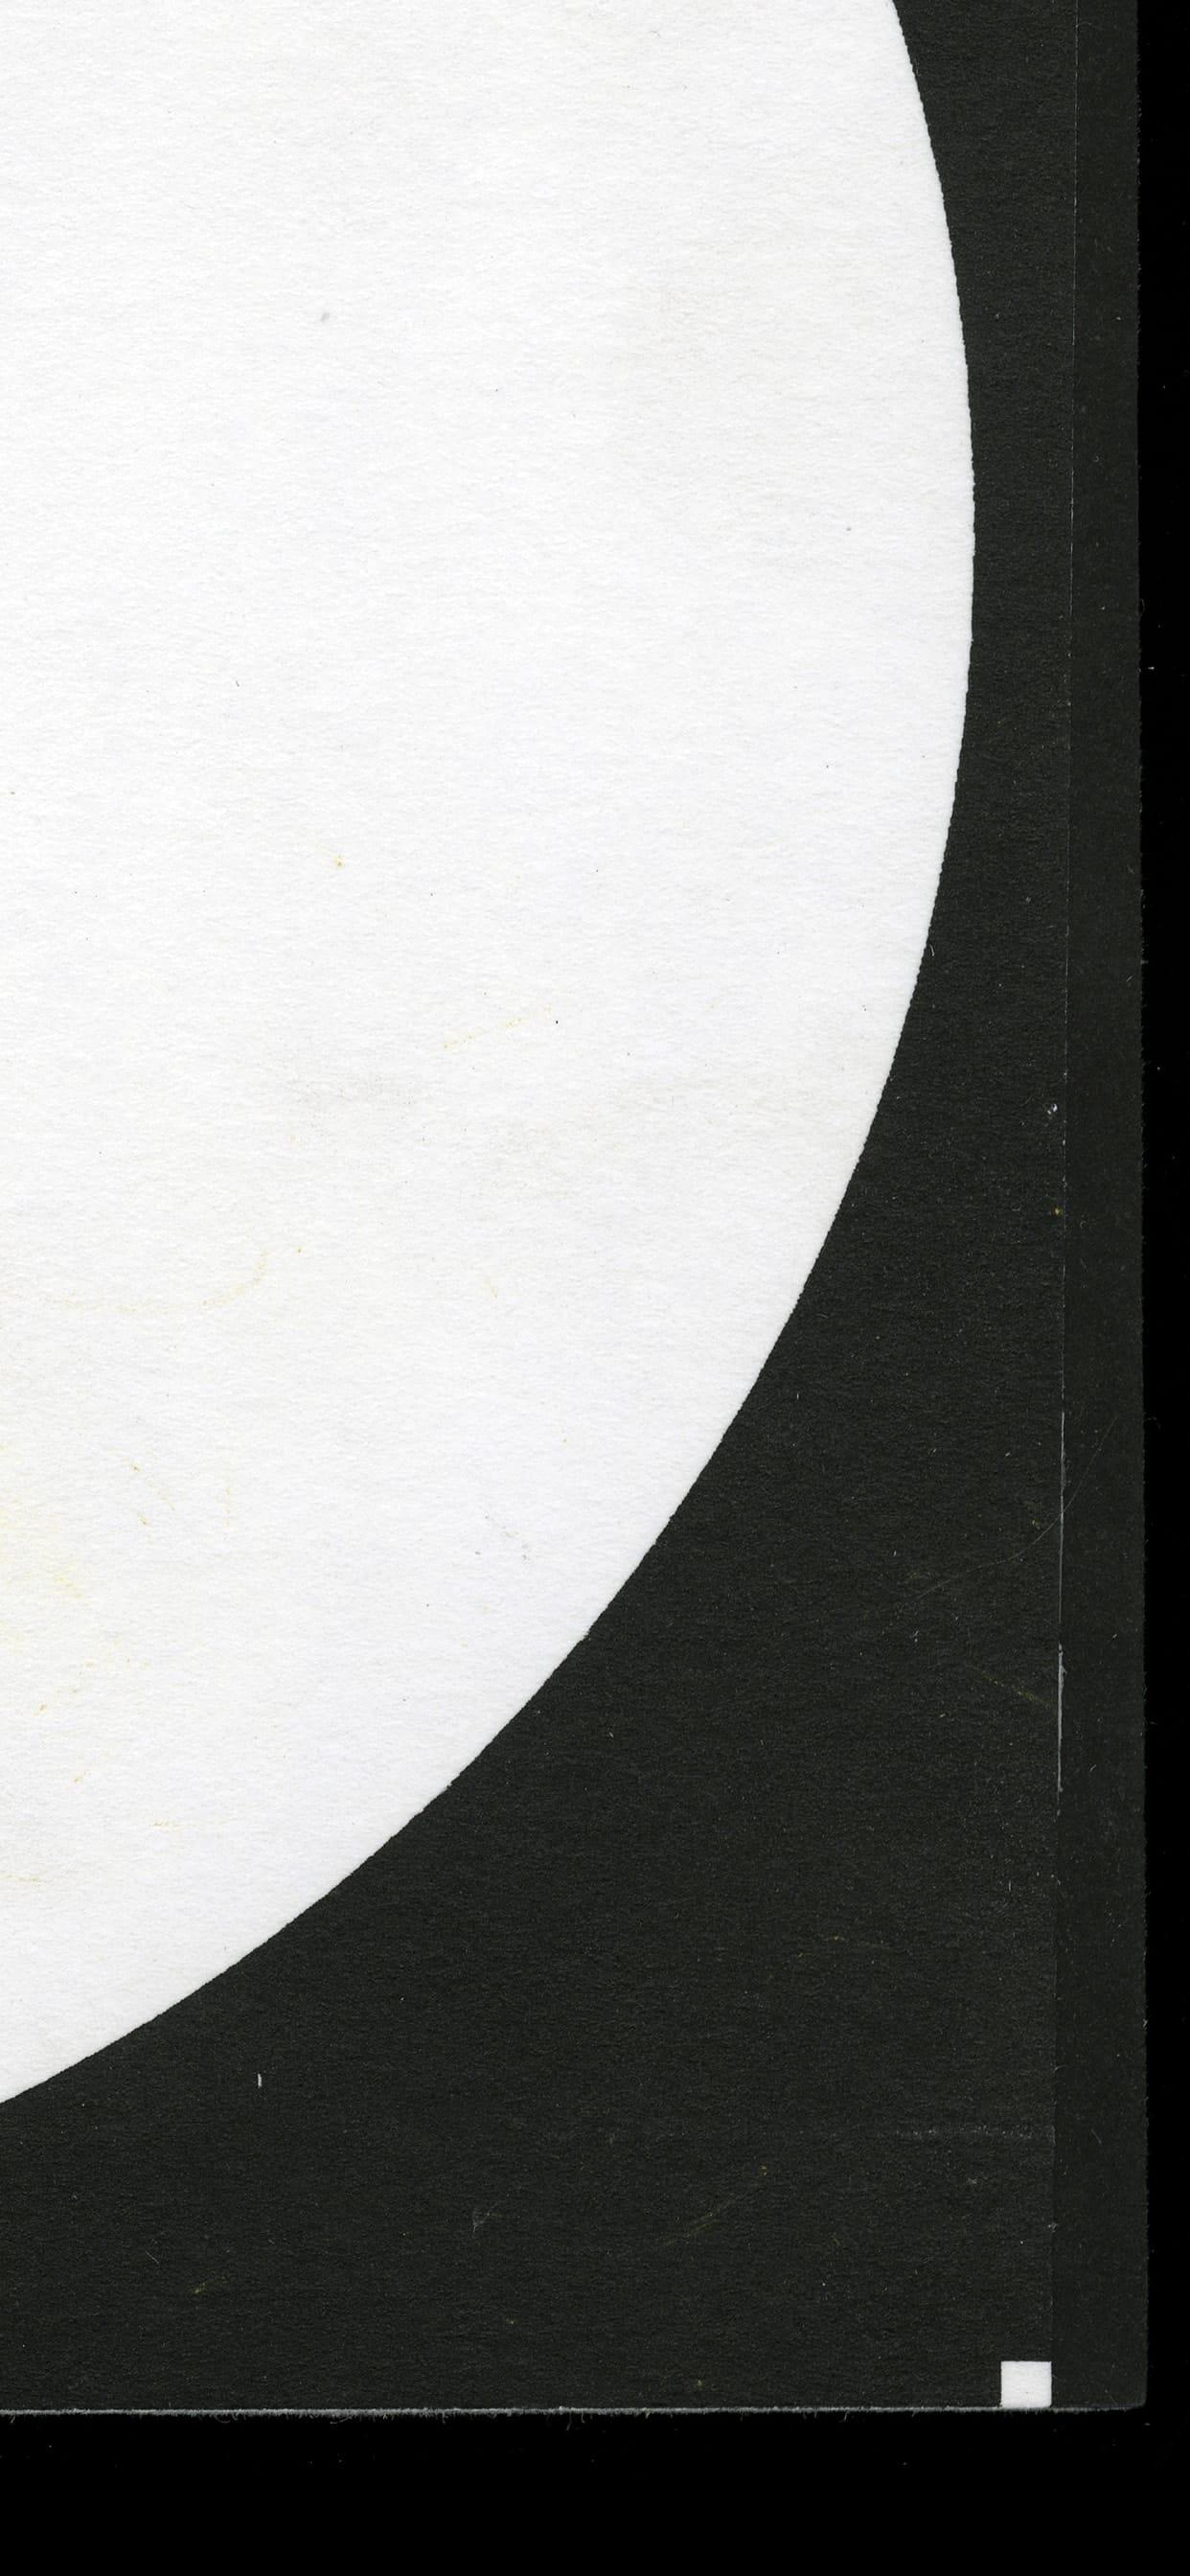 Schwarze Kreise